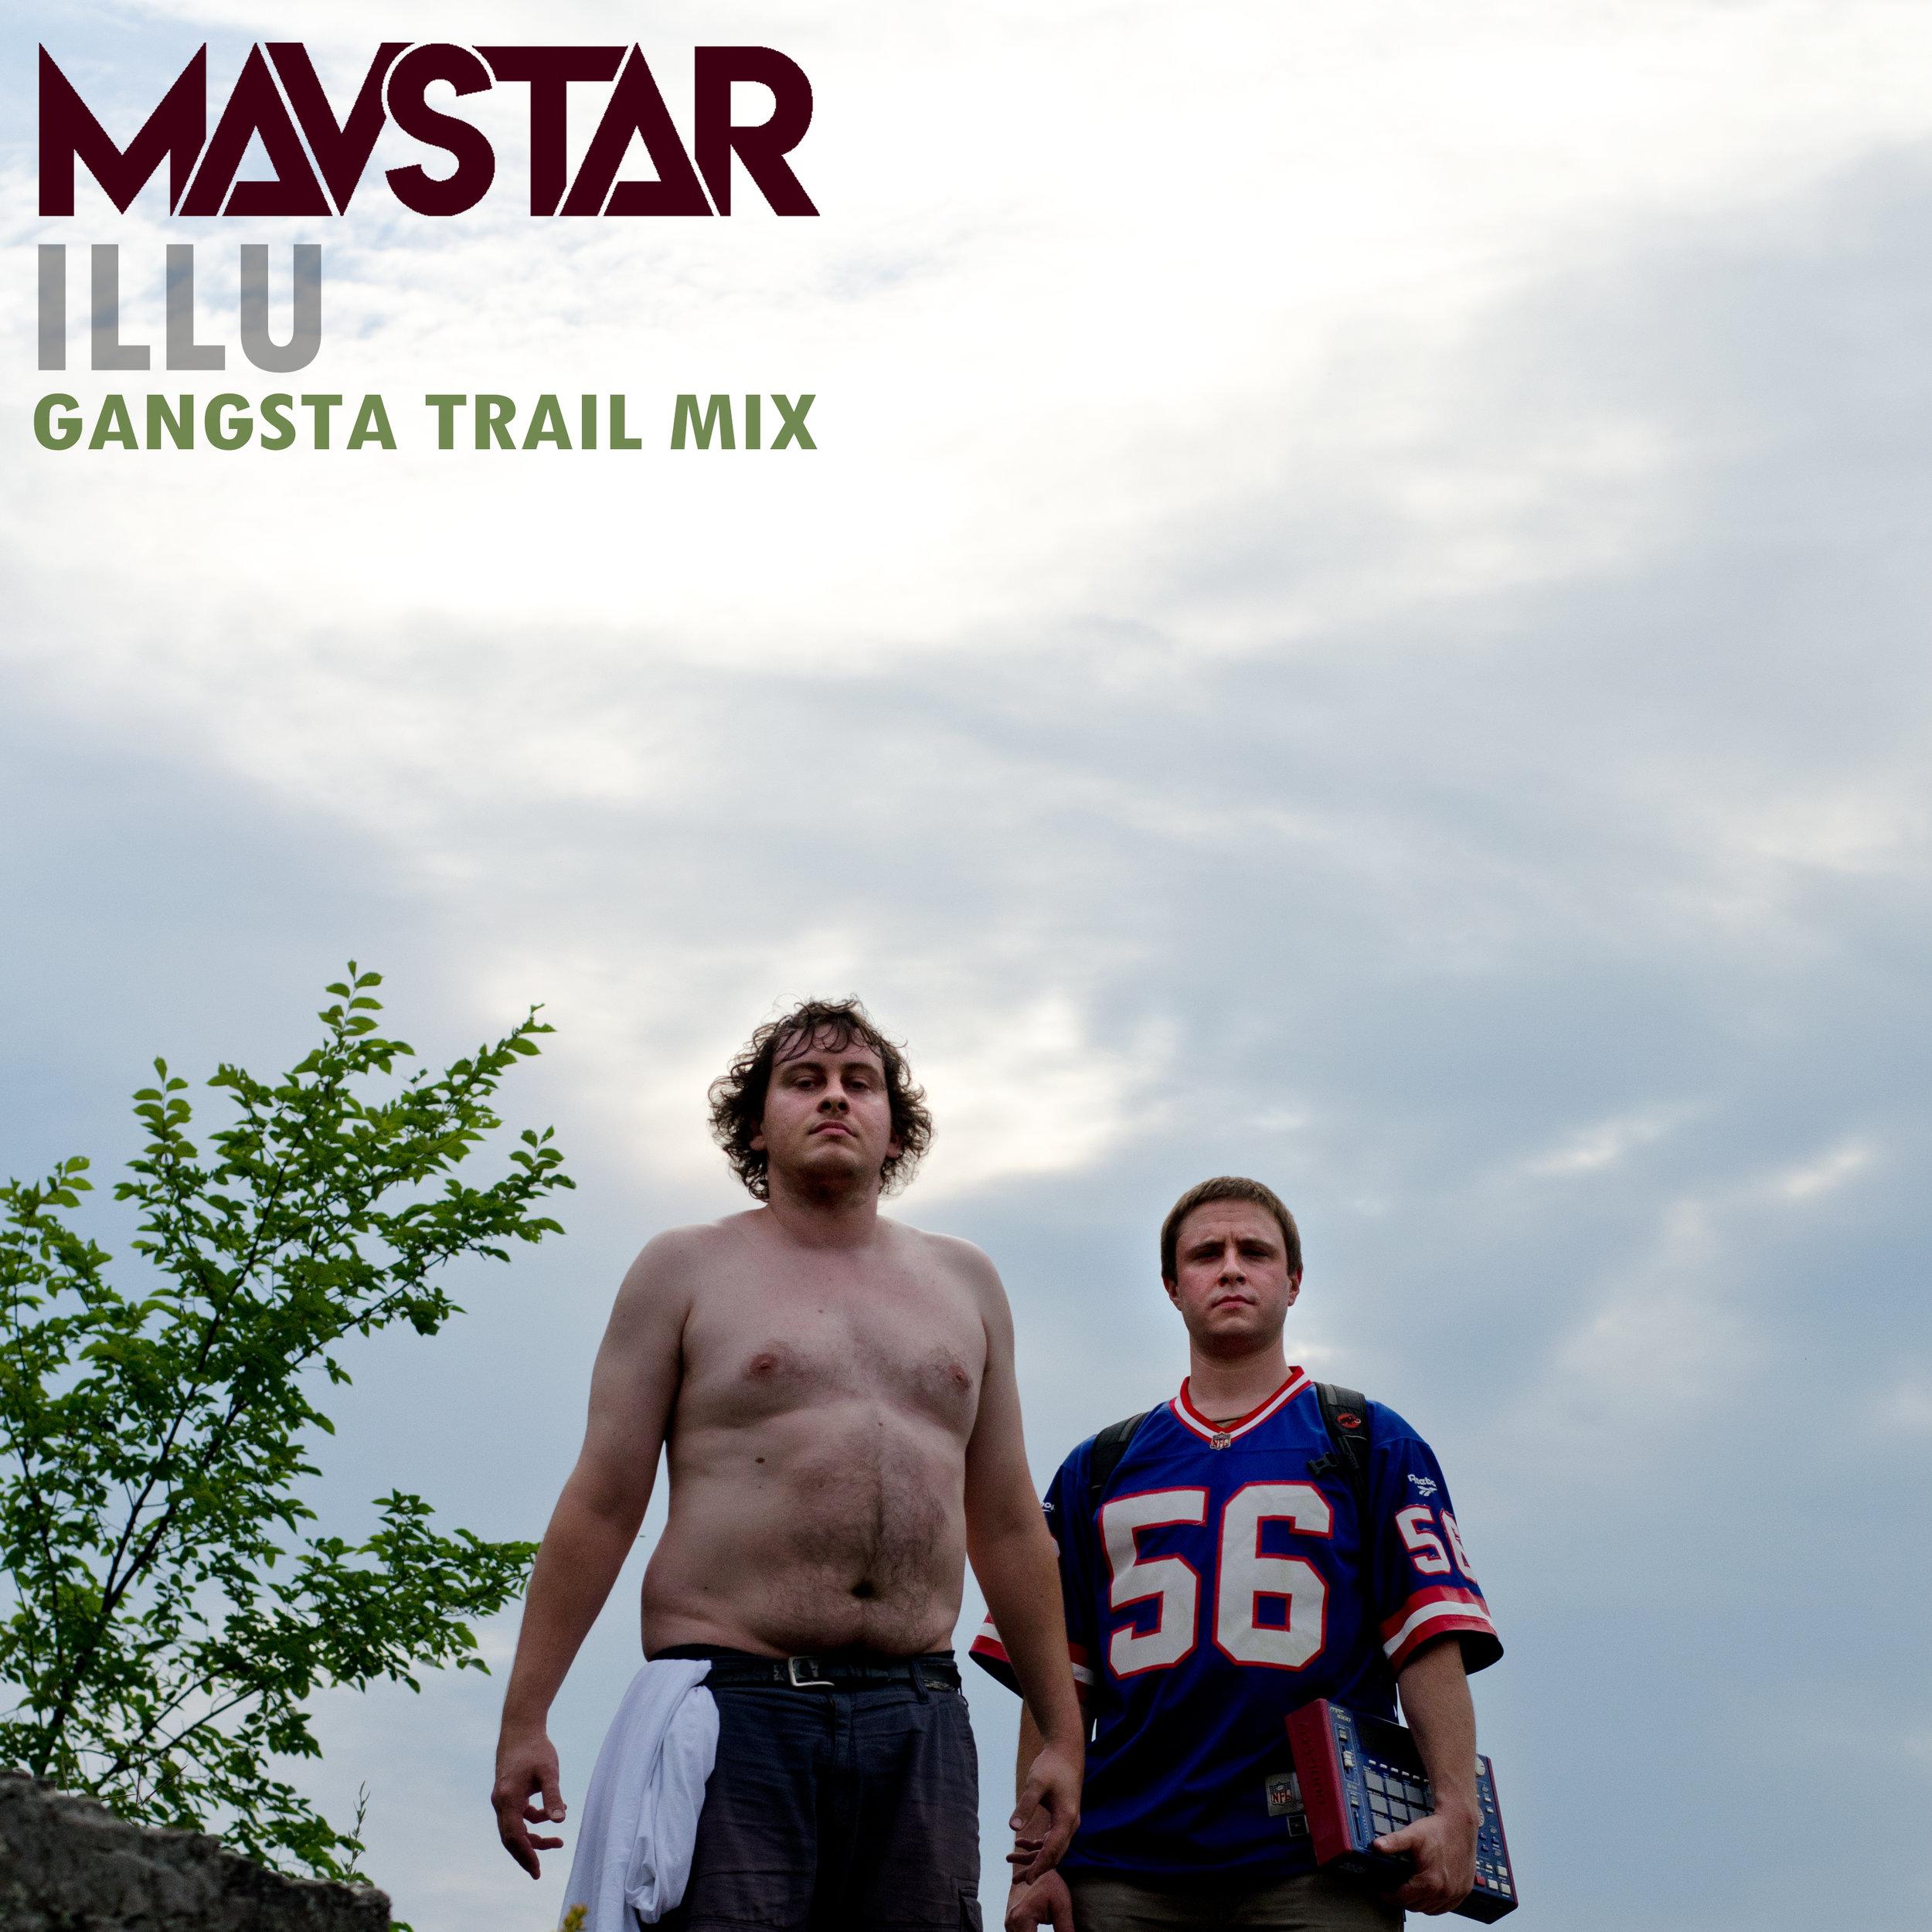 Gangsta Trail Mix - by mavstar & ILLu